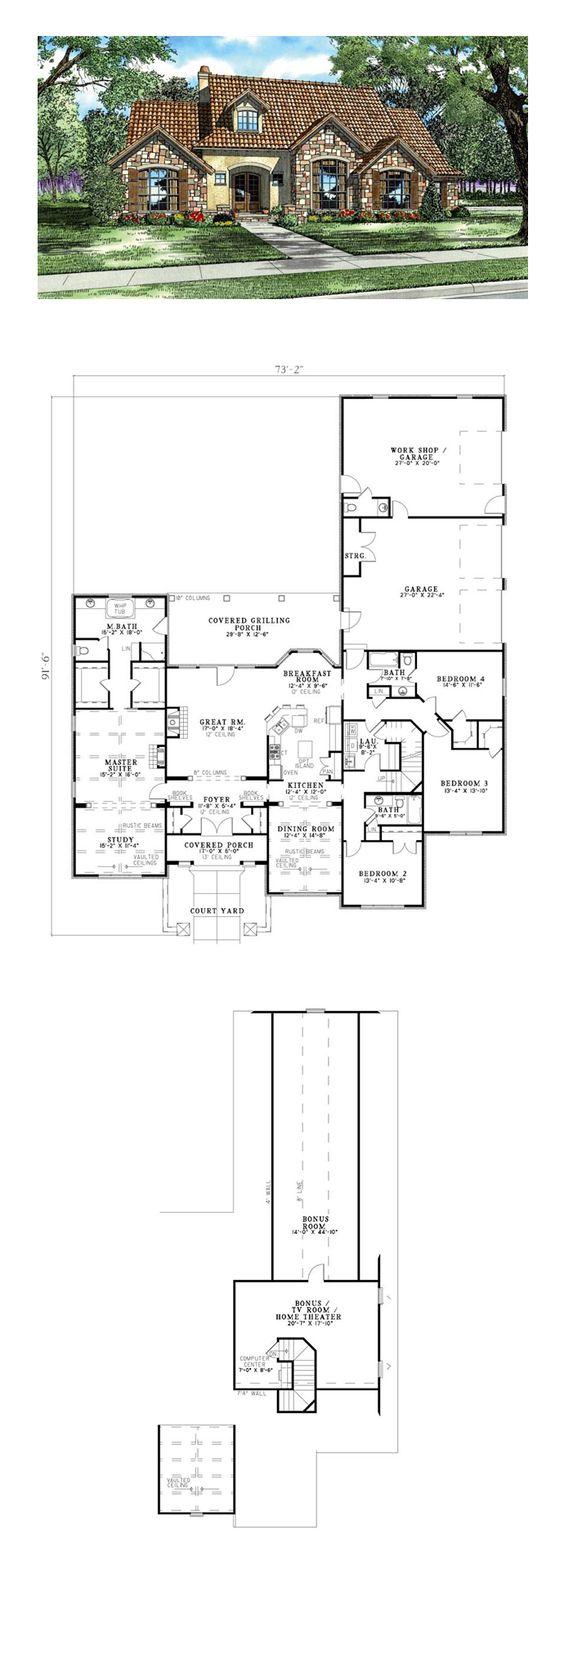 Italian Mediterranean uscan House Plan 82118 Hauspläne ... size: 564 x 1664 post ID: 2 File size: 0 B